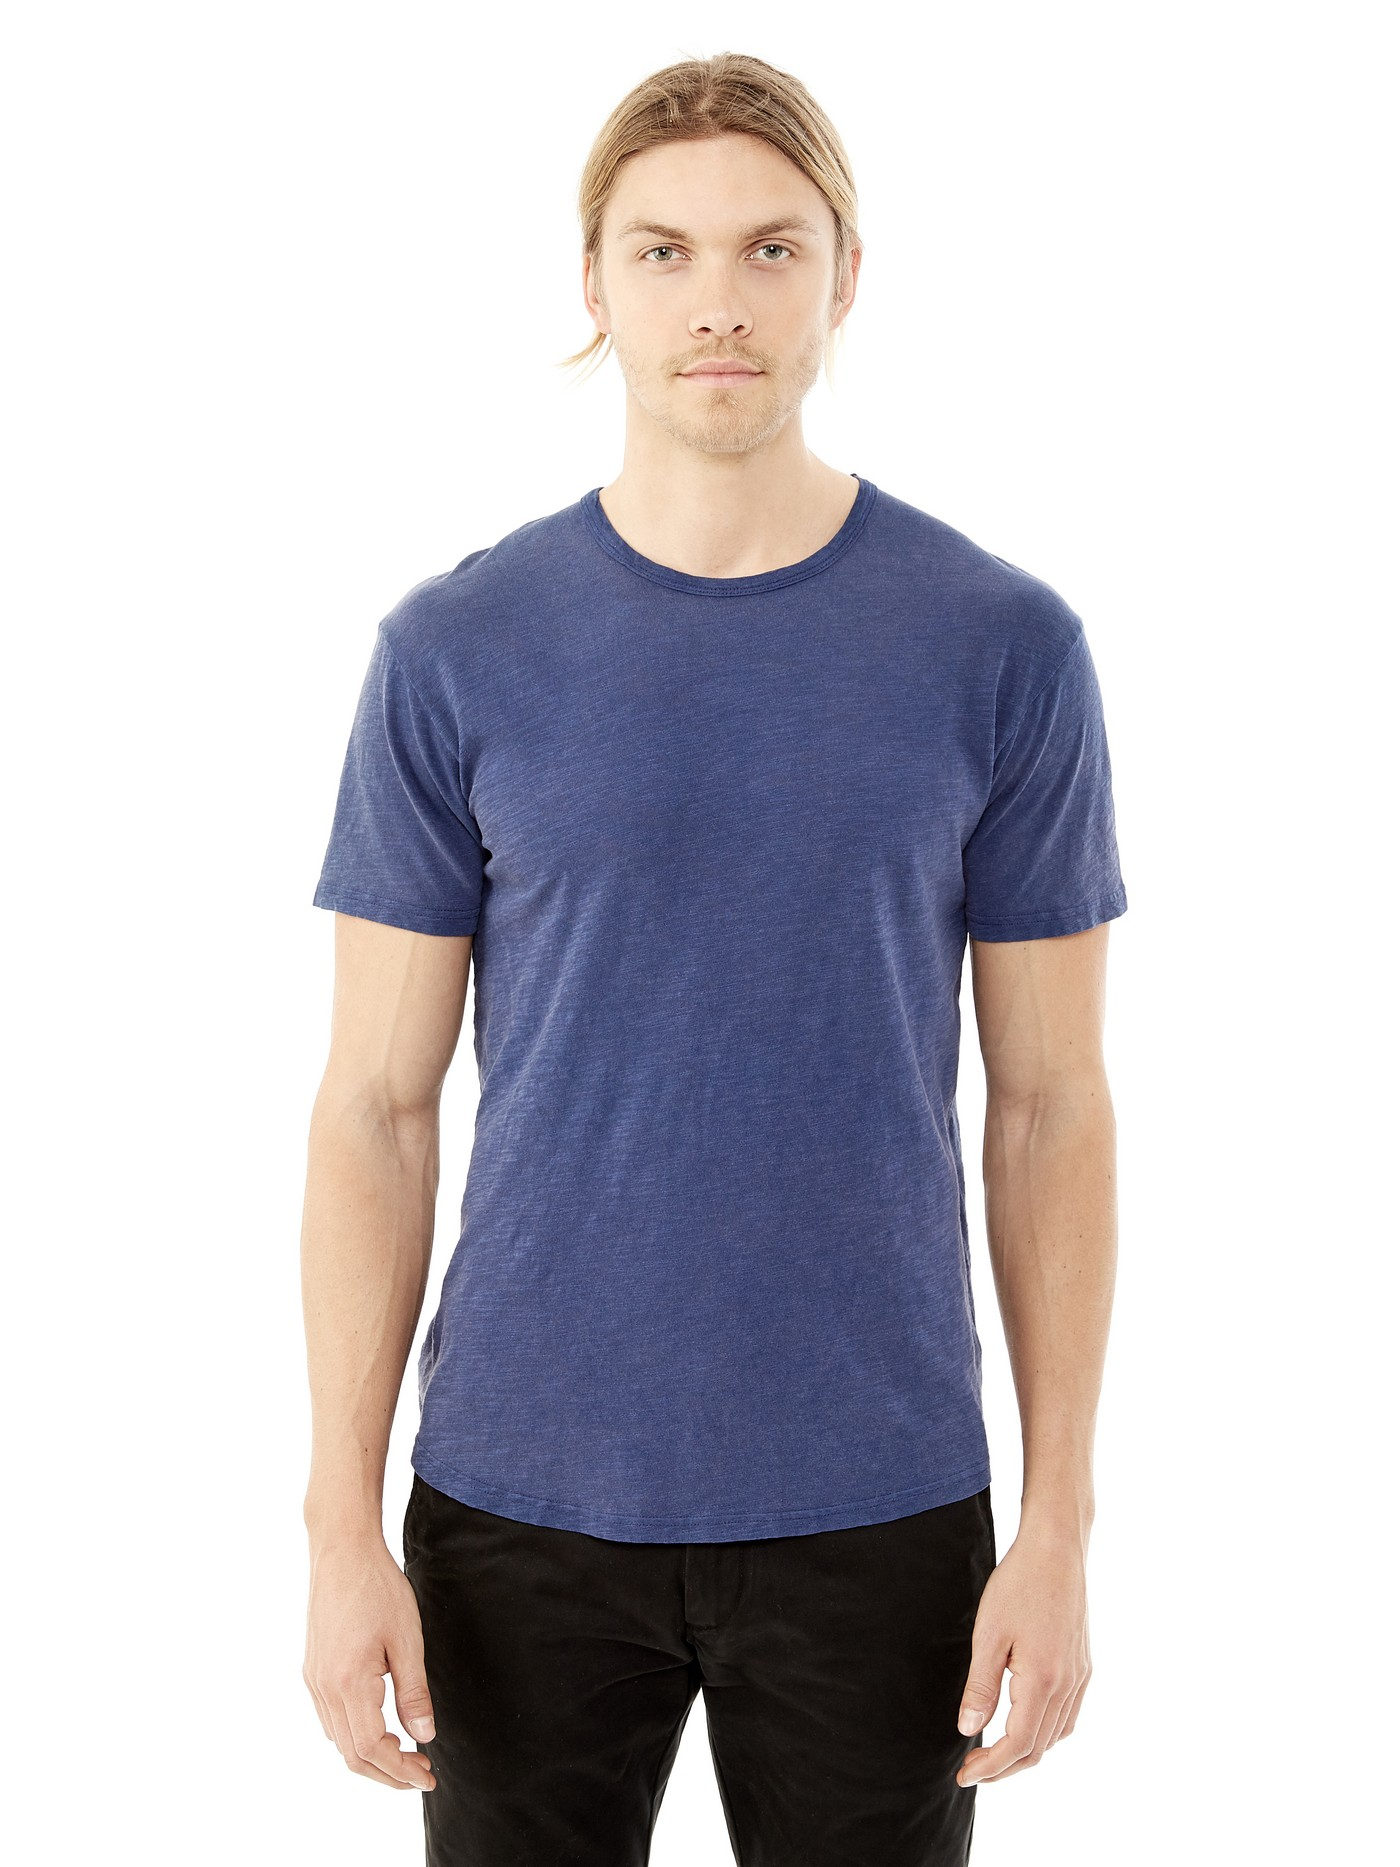 Lyst alternative apparel washed out slub crew t shirt in for What is a slub shirt